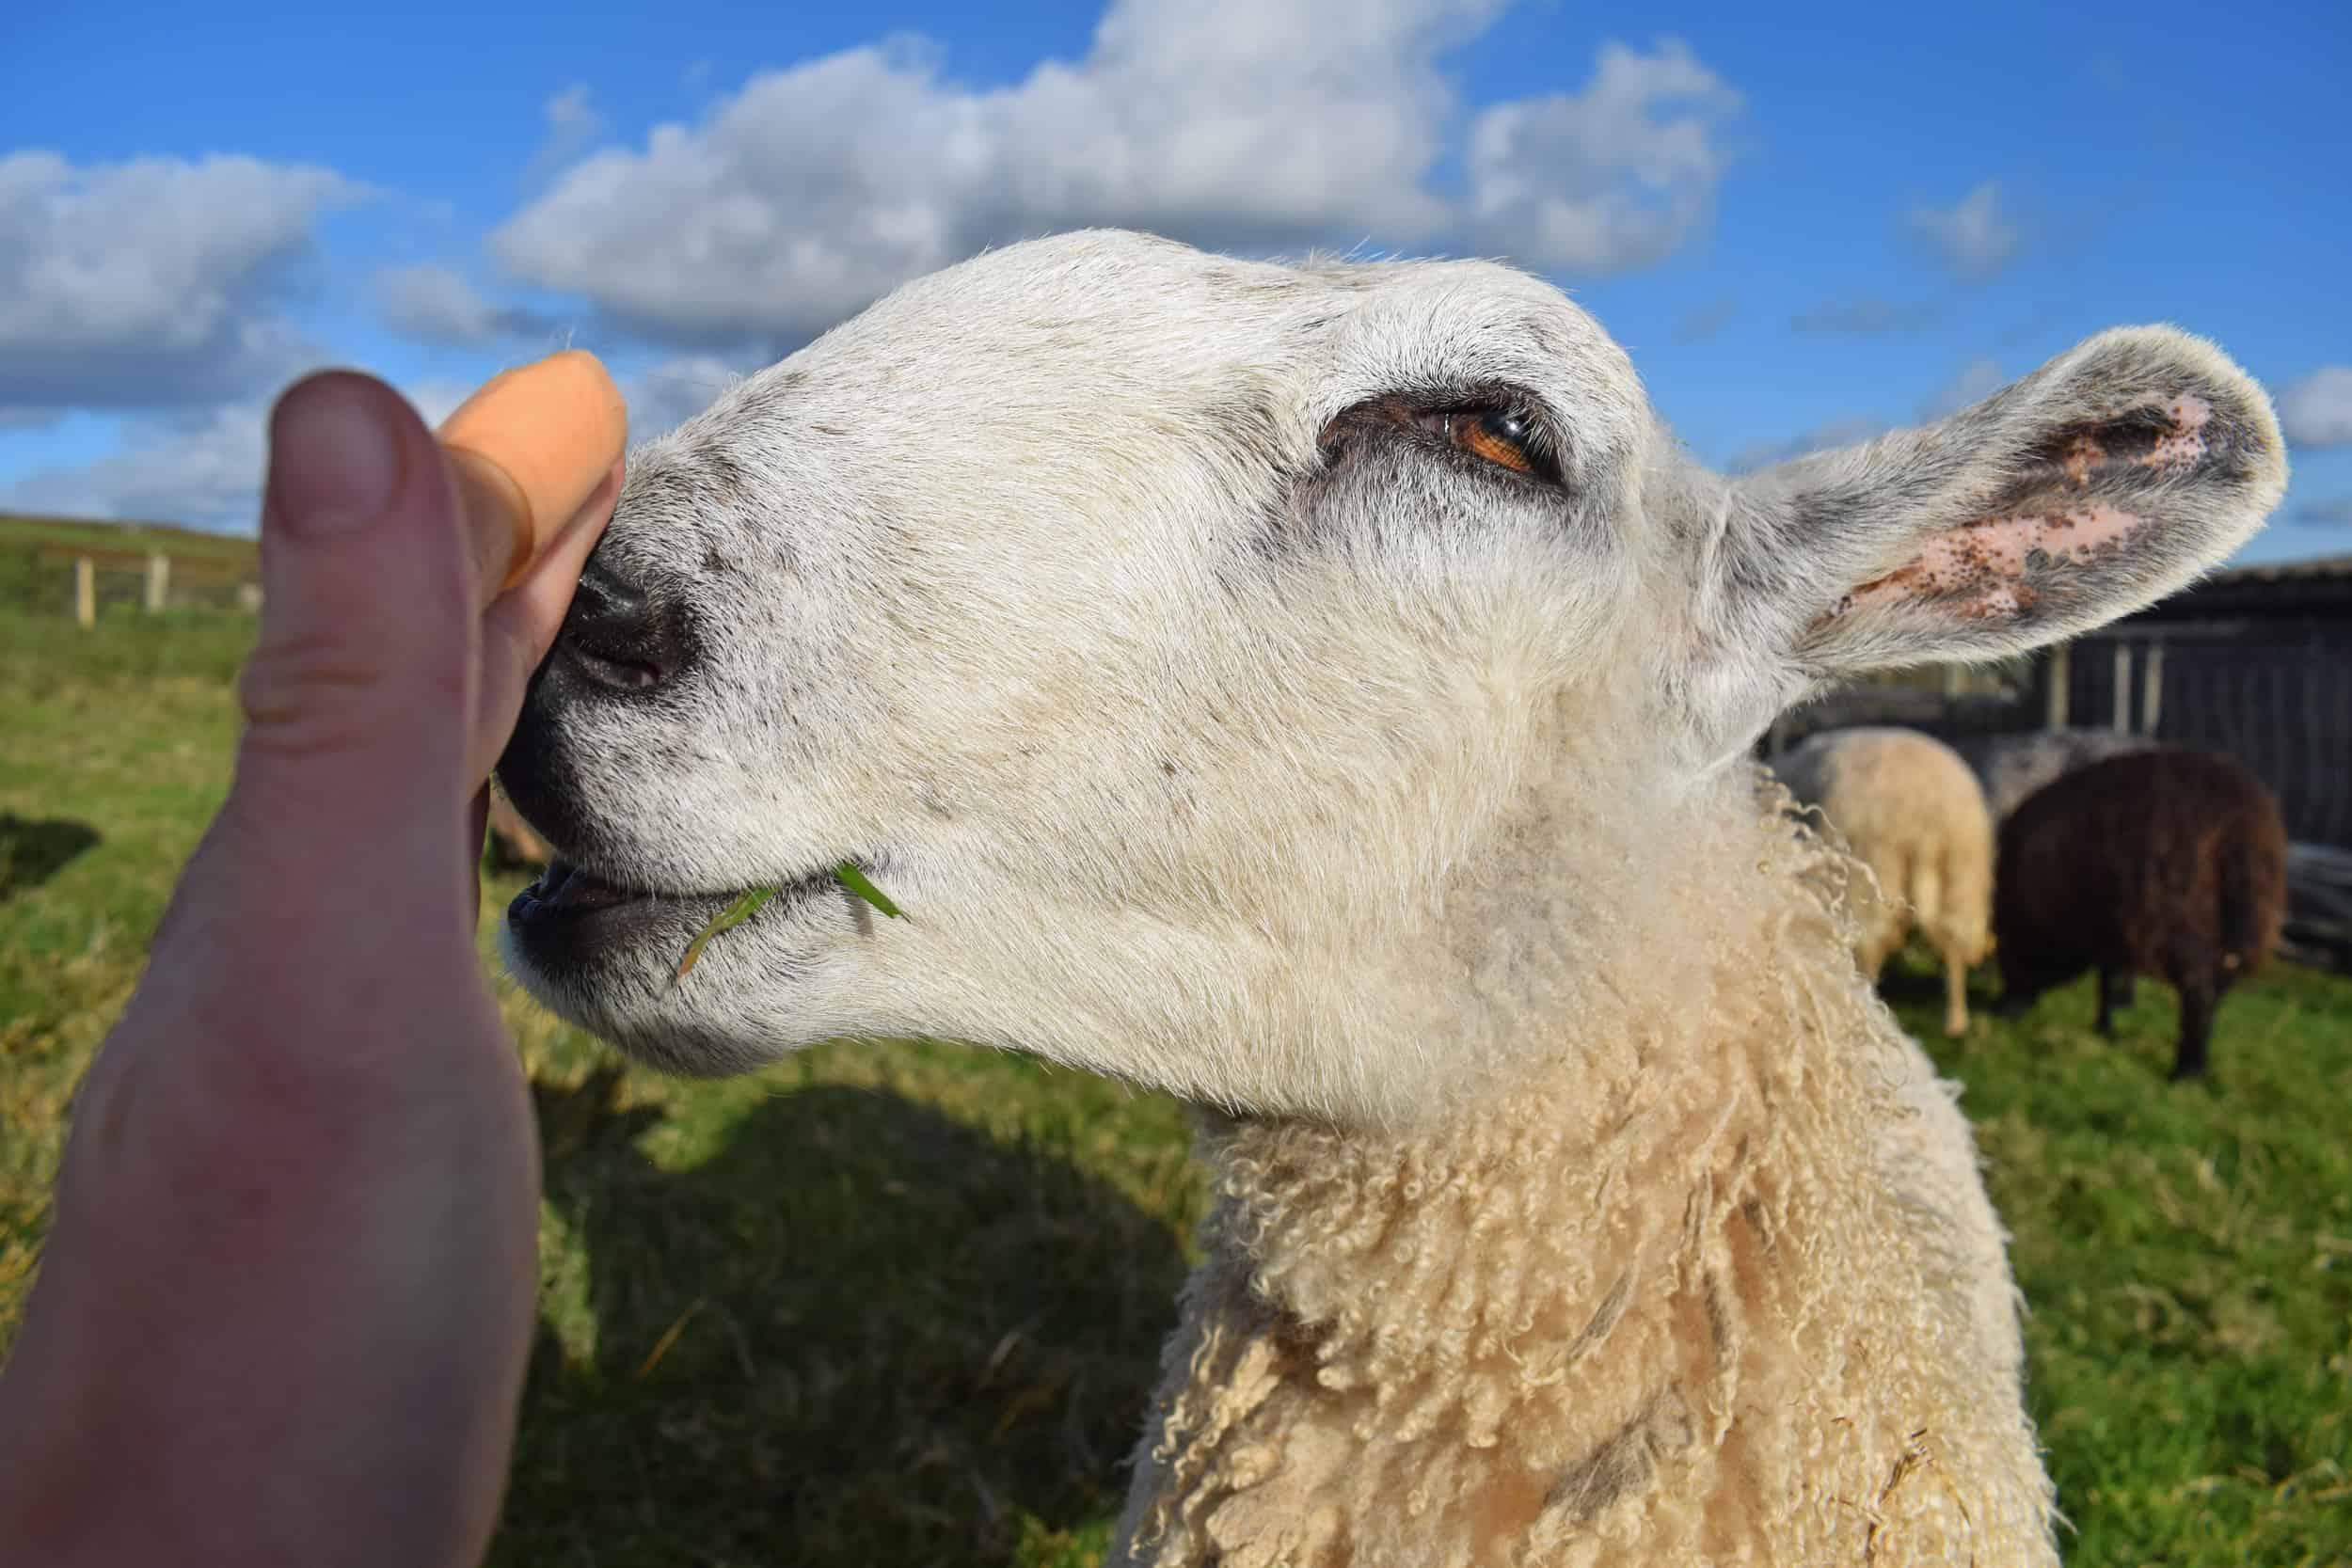 Lily bfl blueface leicester sheep ewe lamb pet bottle baby lamb roman nose